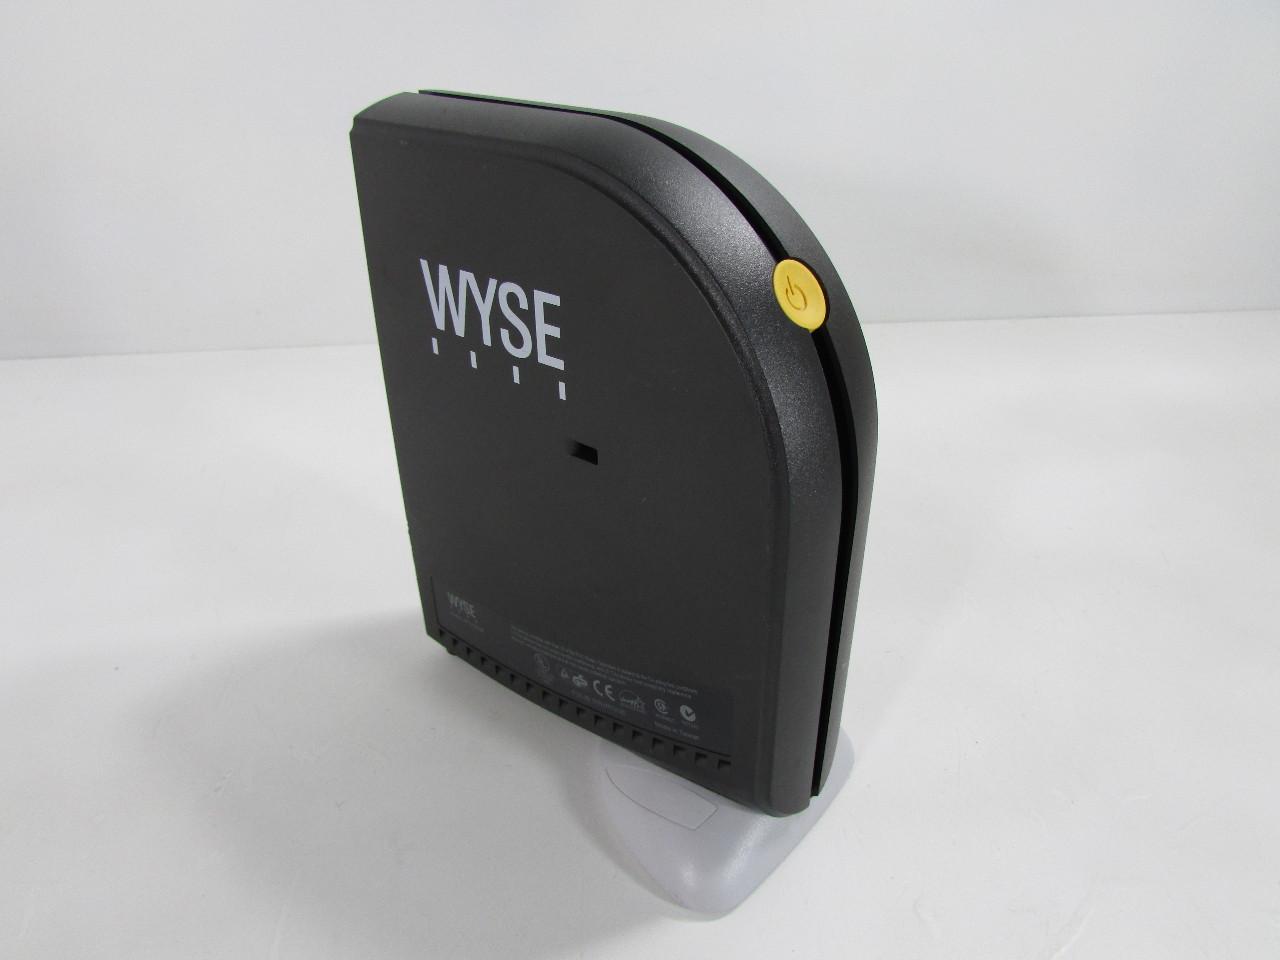 Dell Wyse - Wikipedia